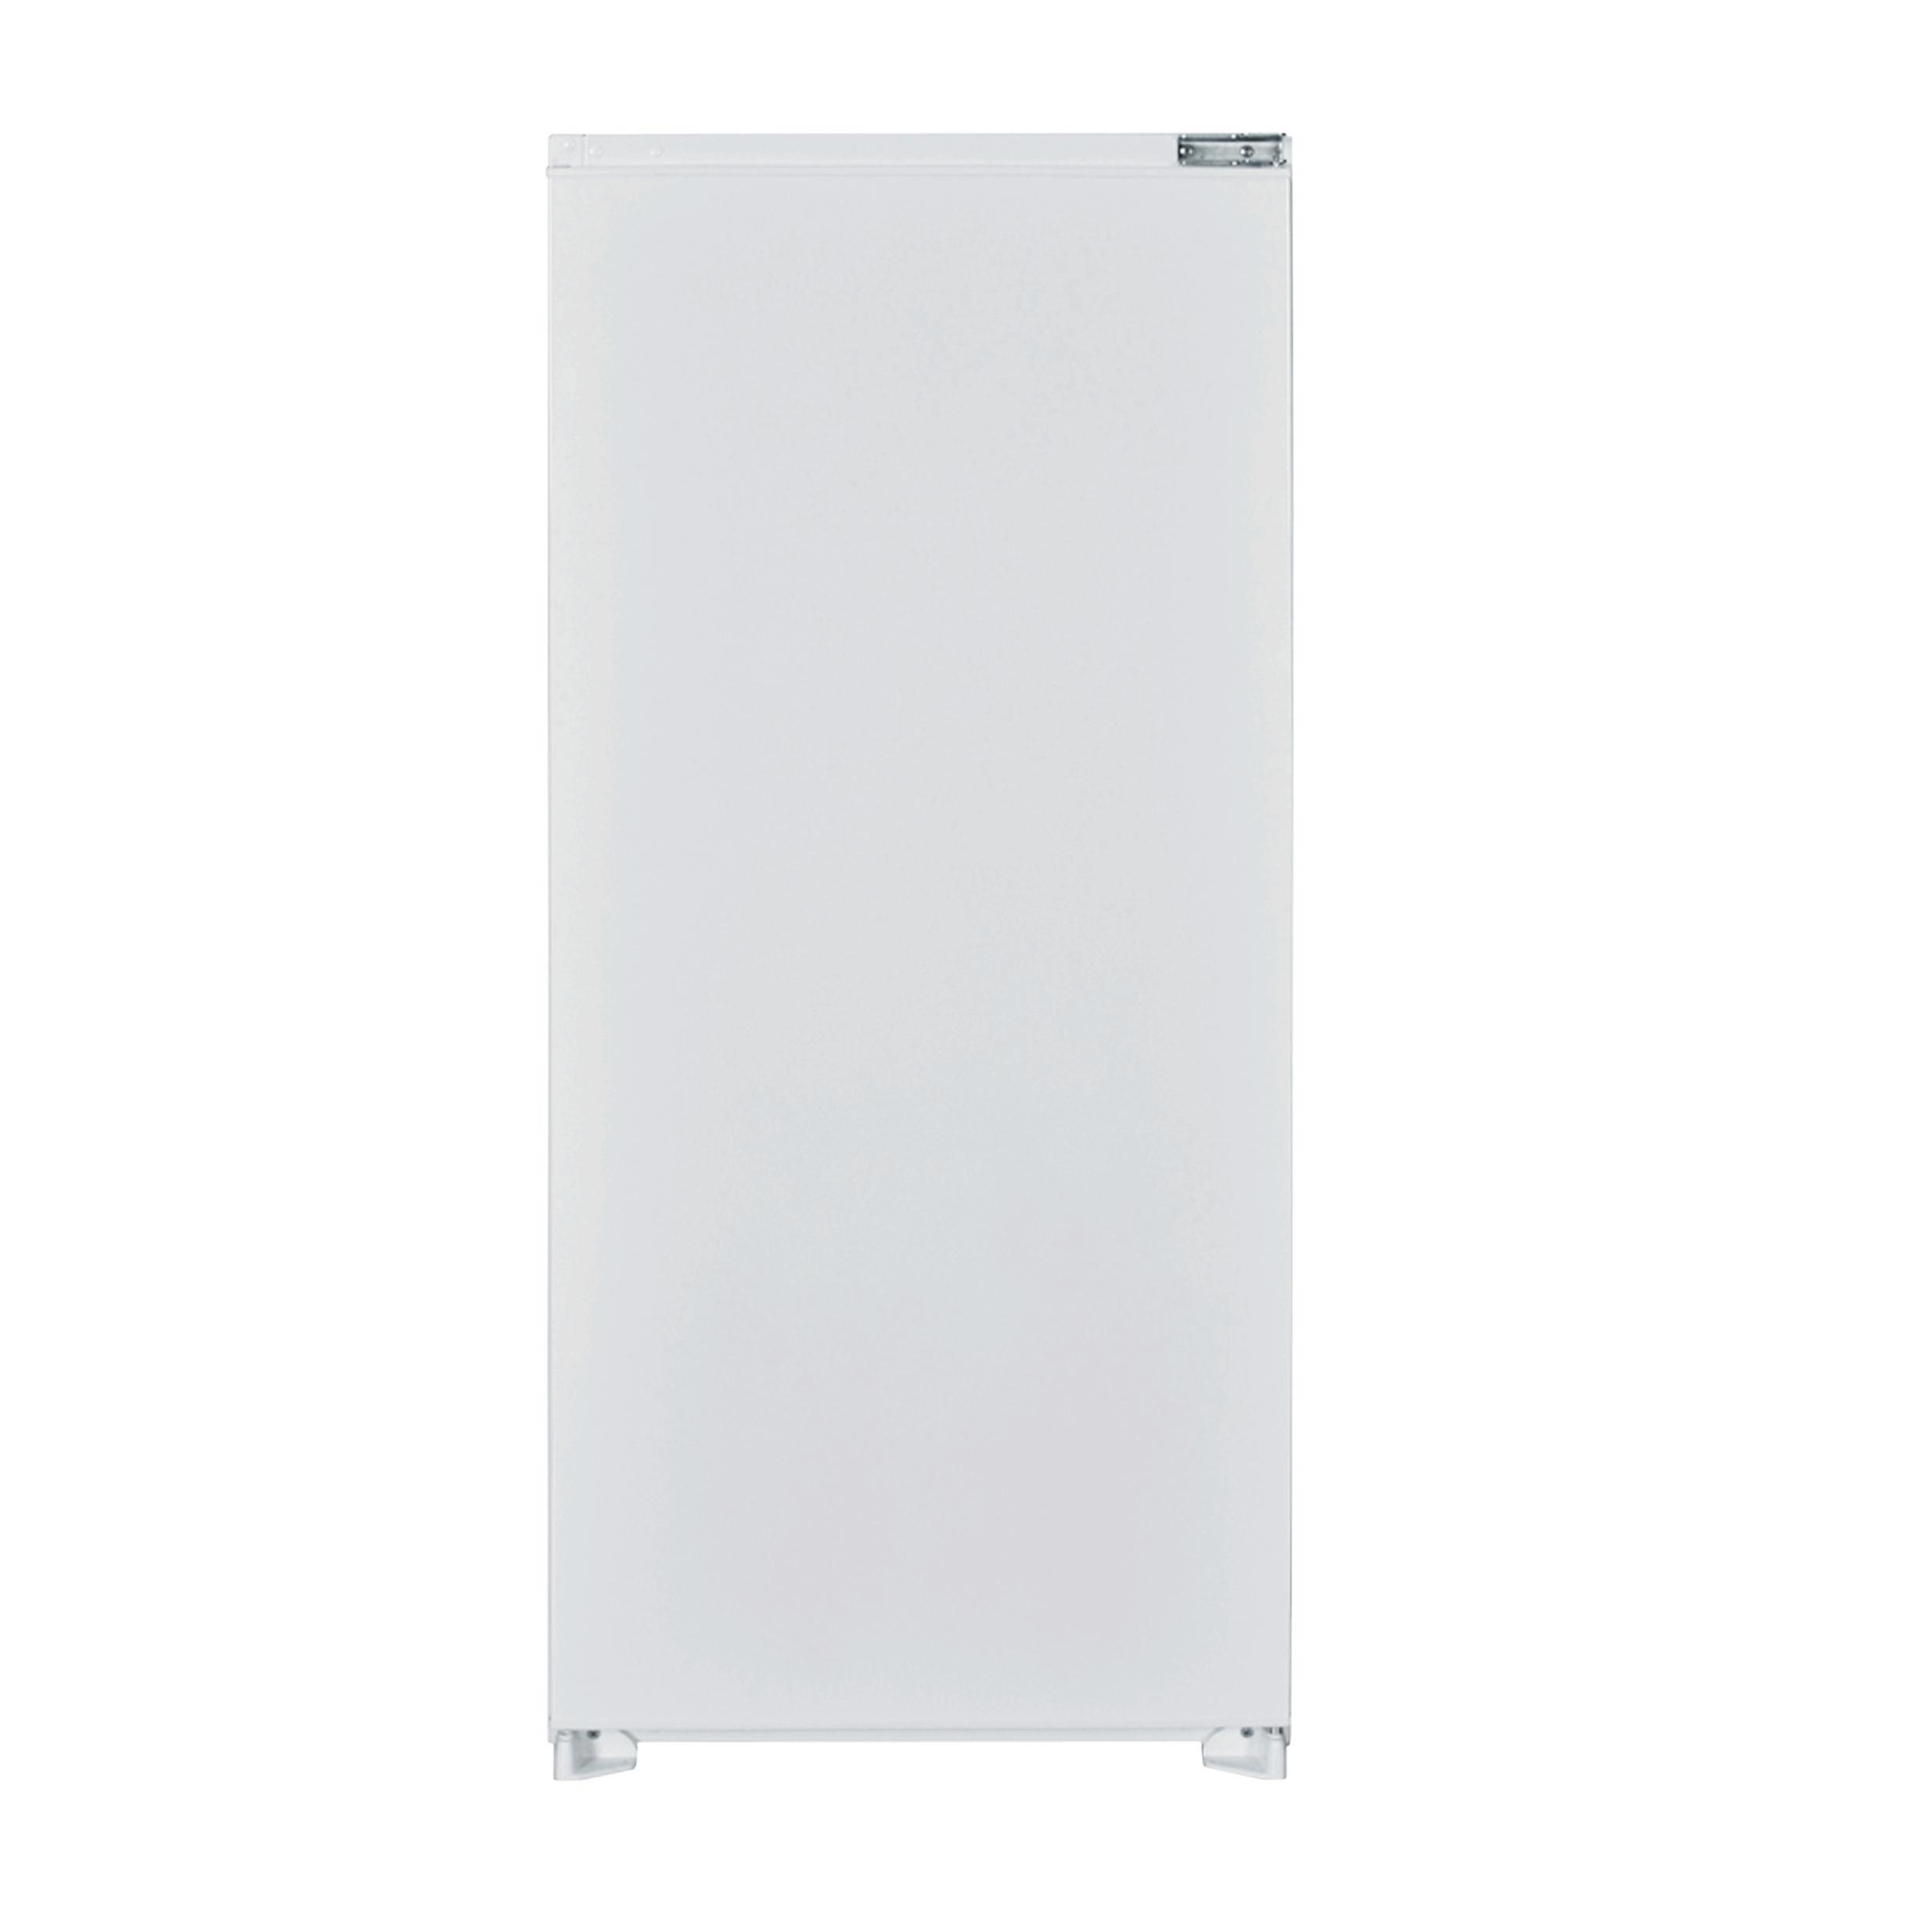 Kühl-Gefrier-Kombination Ks122.4a++ - Weiß, MODERN, Metall (54/122,5/54,5cm)